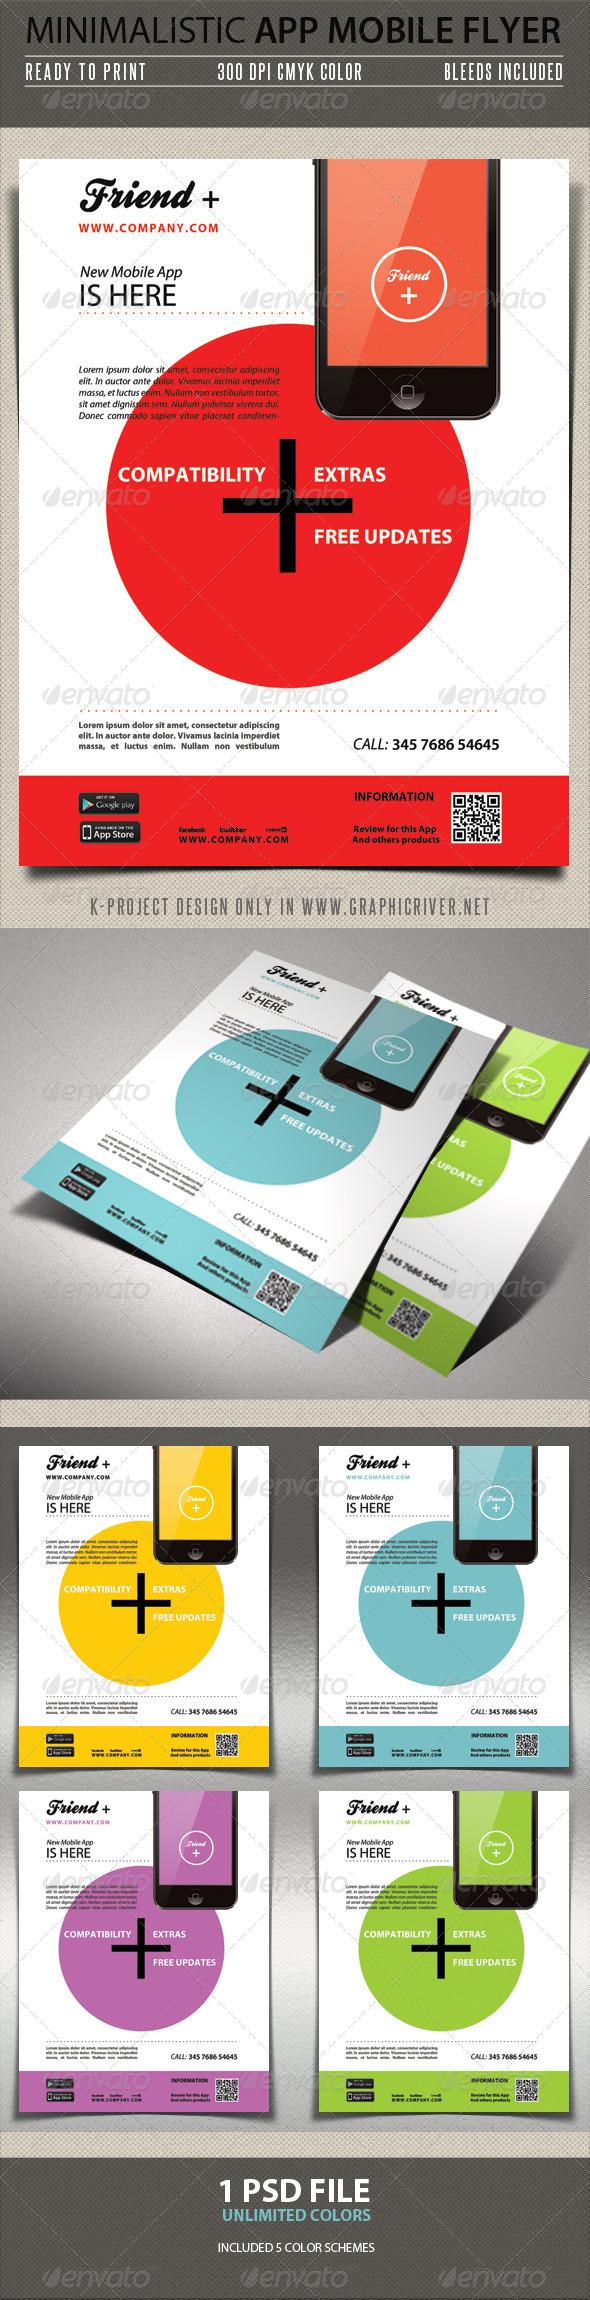 GraphicRiver Minimalistic App Mobile Flyer 5833144